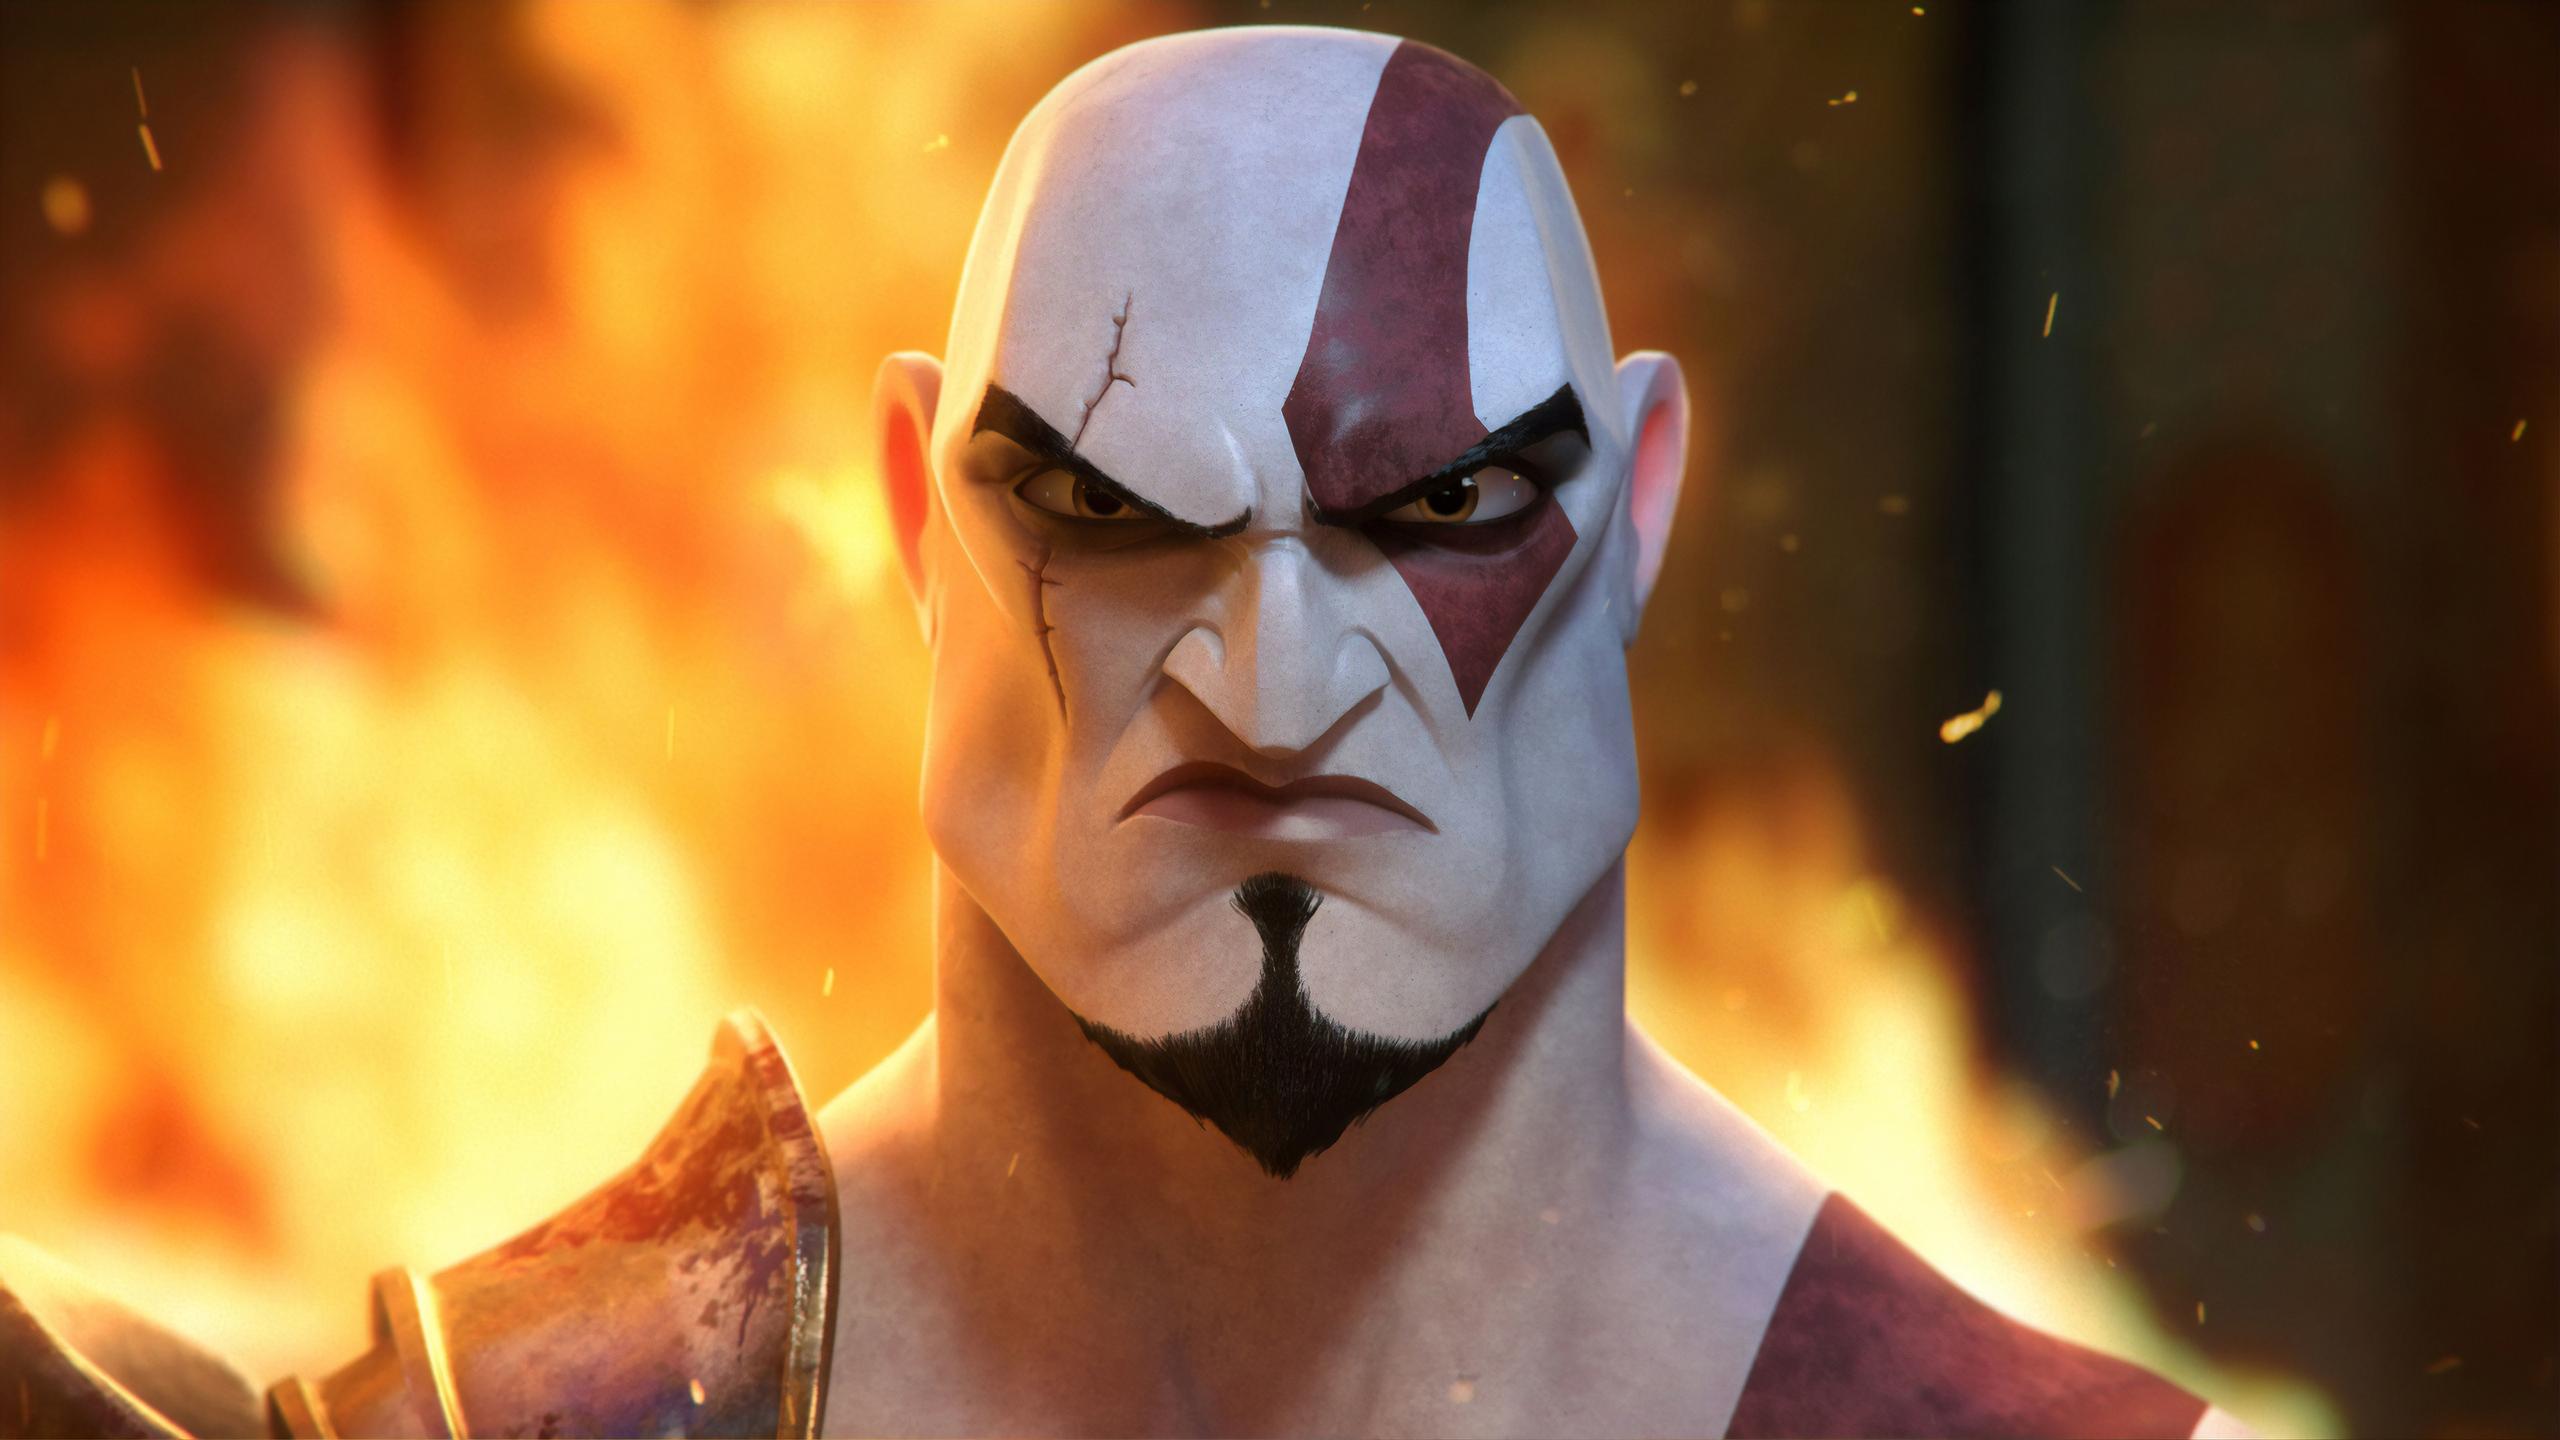 kratos-angry-4k-s9.jpg